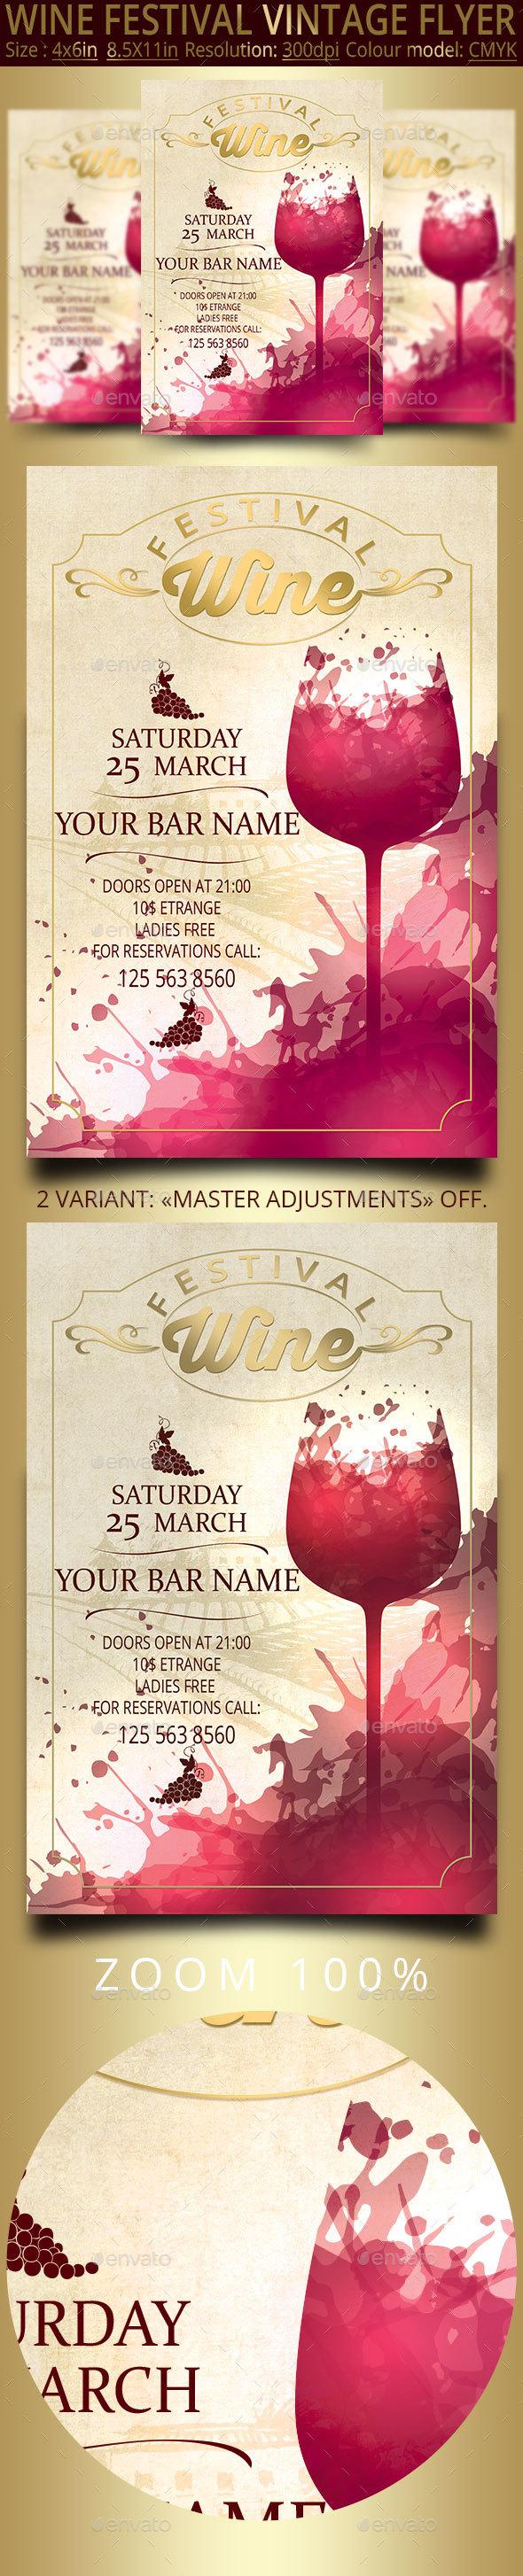 Wine Festival Vintage Flyer Wine Festival Flyer Club Design